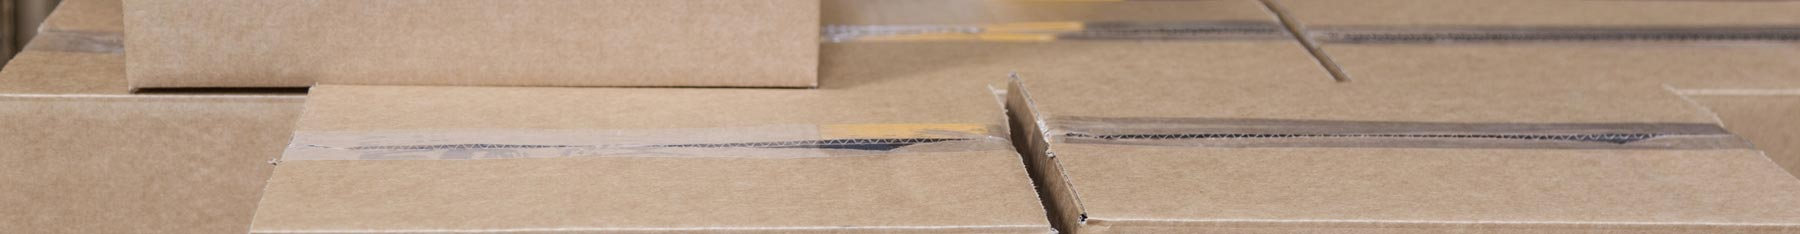 reliant packaging website banner